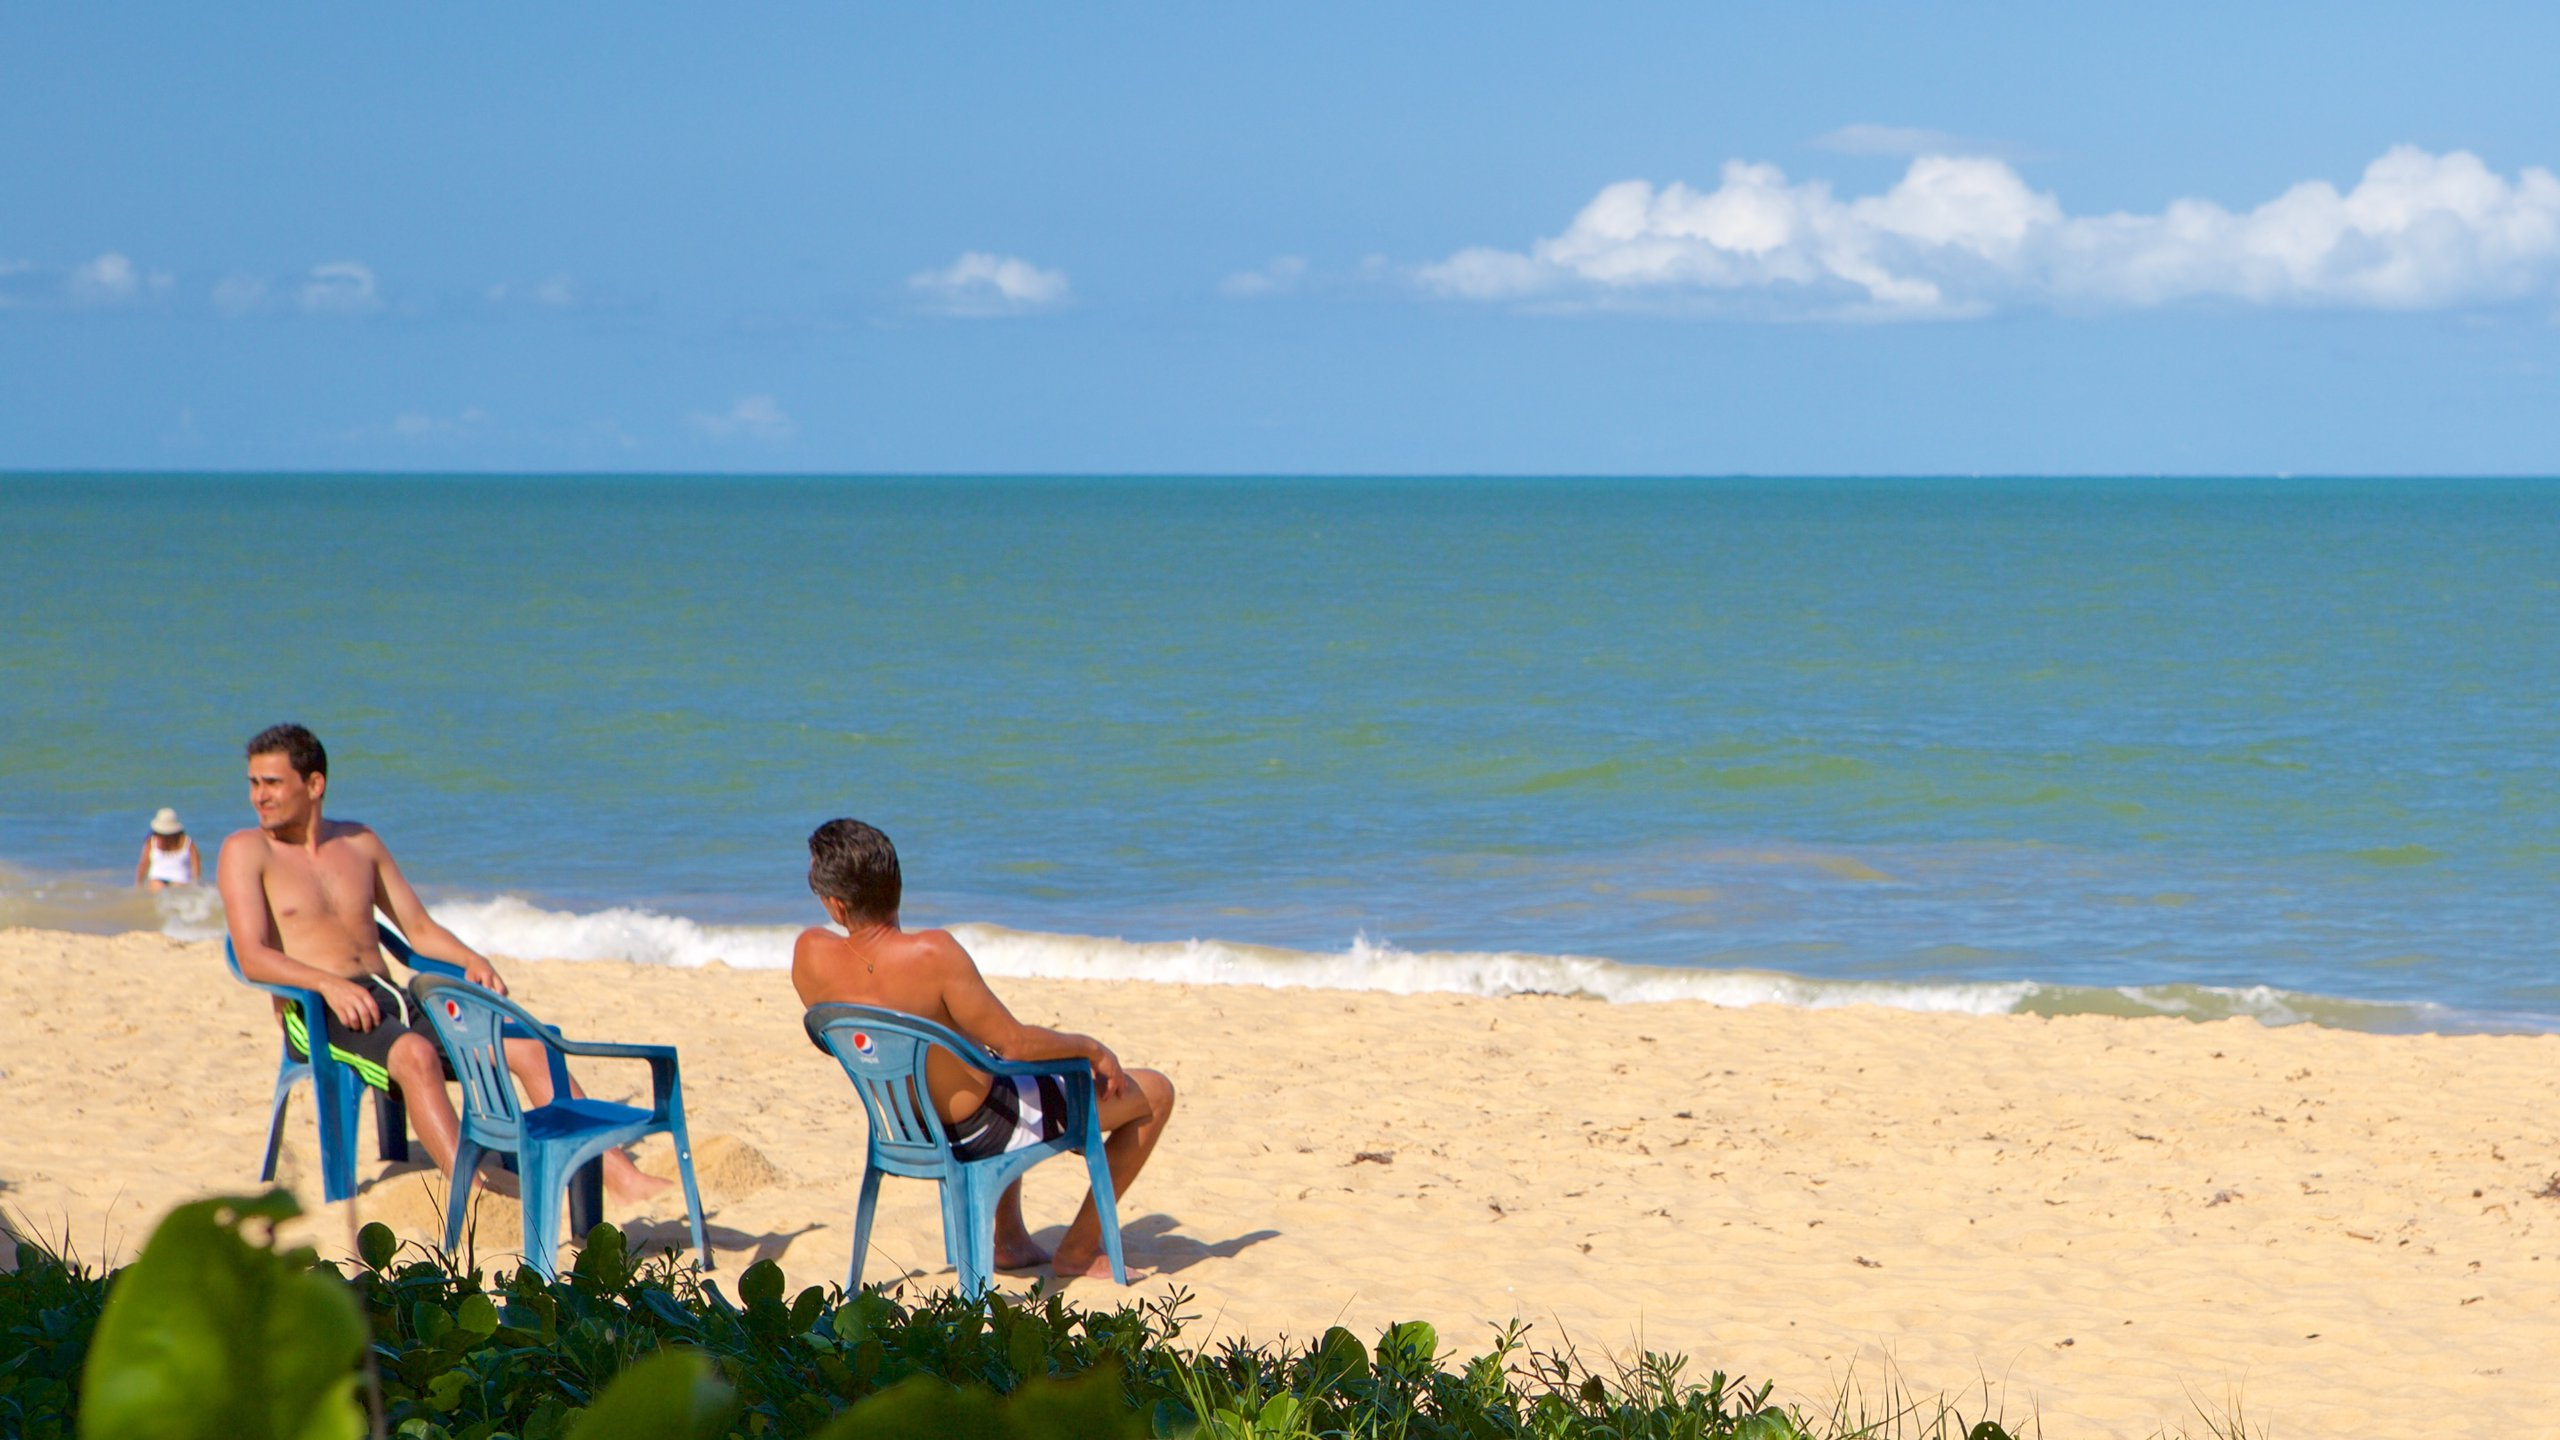 Taperapua Beach, Porto Seguro, Bahia State, Brazil